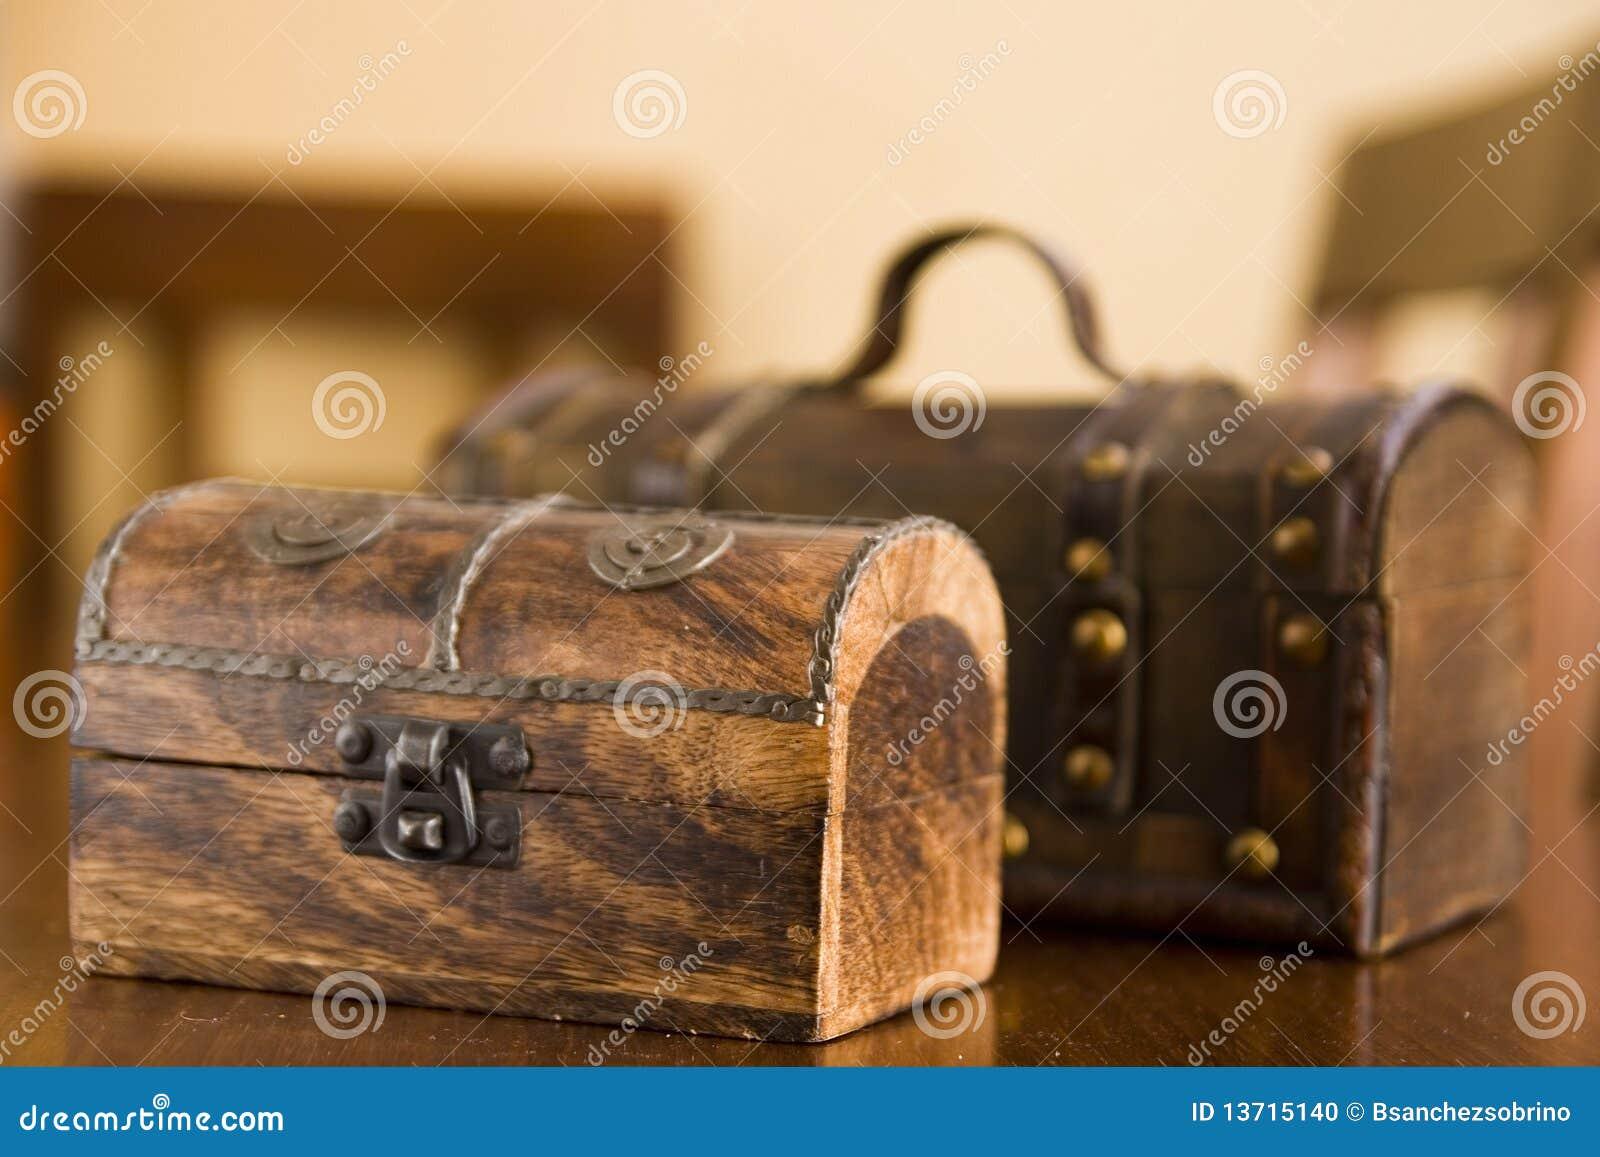 boxes decorative wooden - Decorative Wooden Boxes